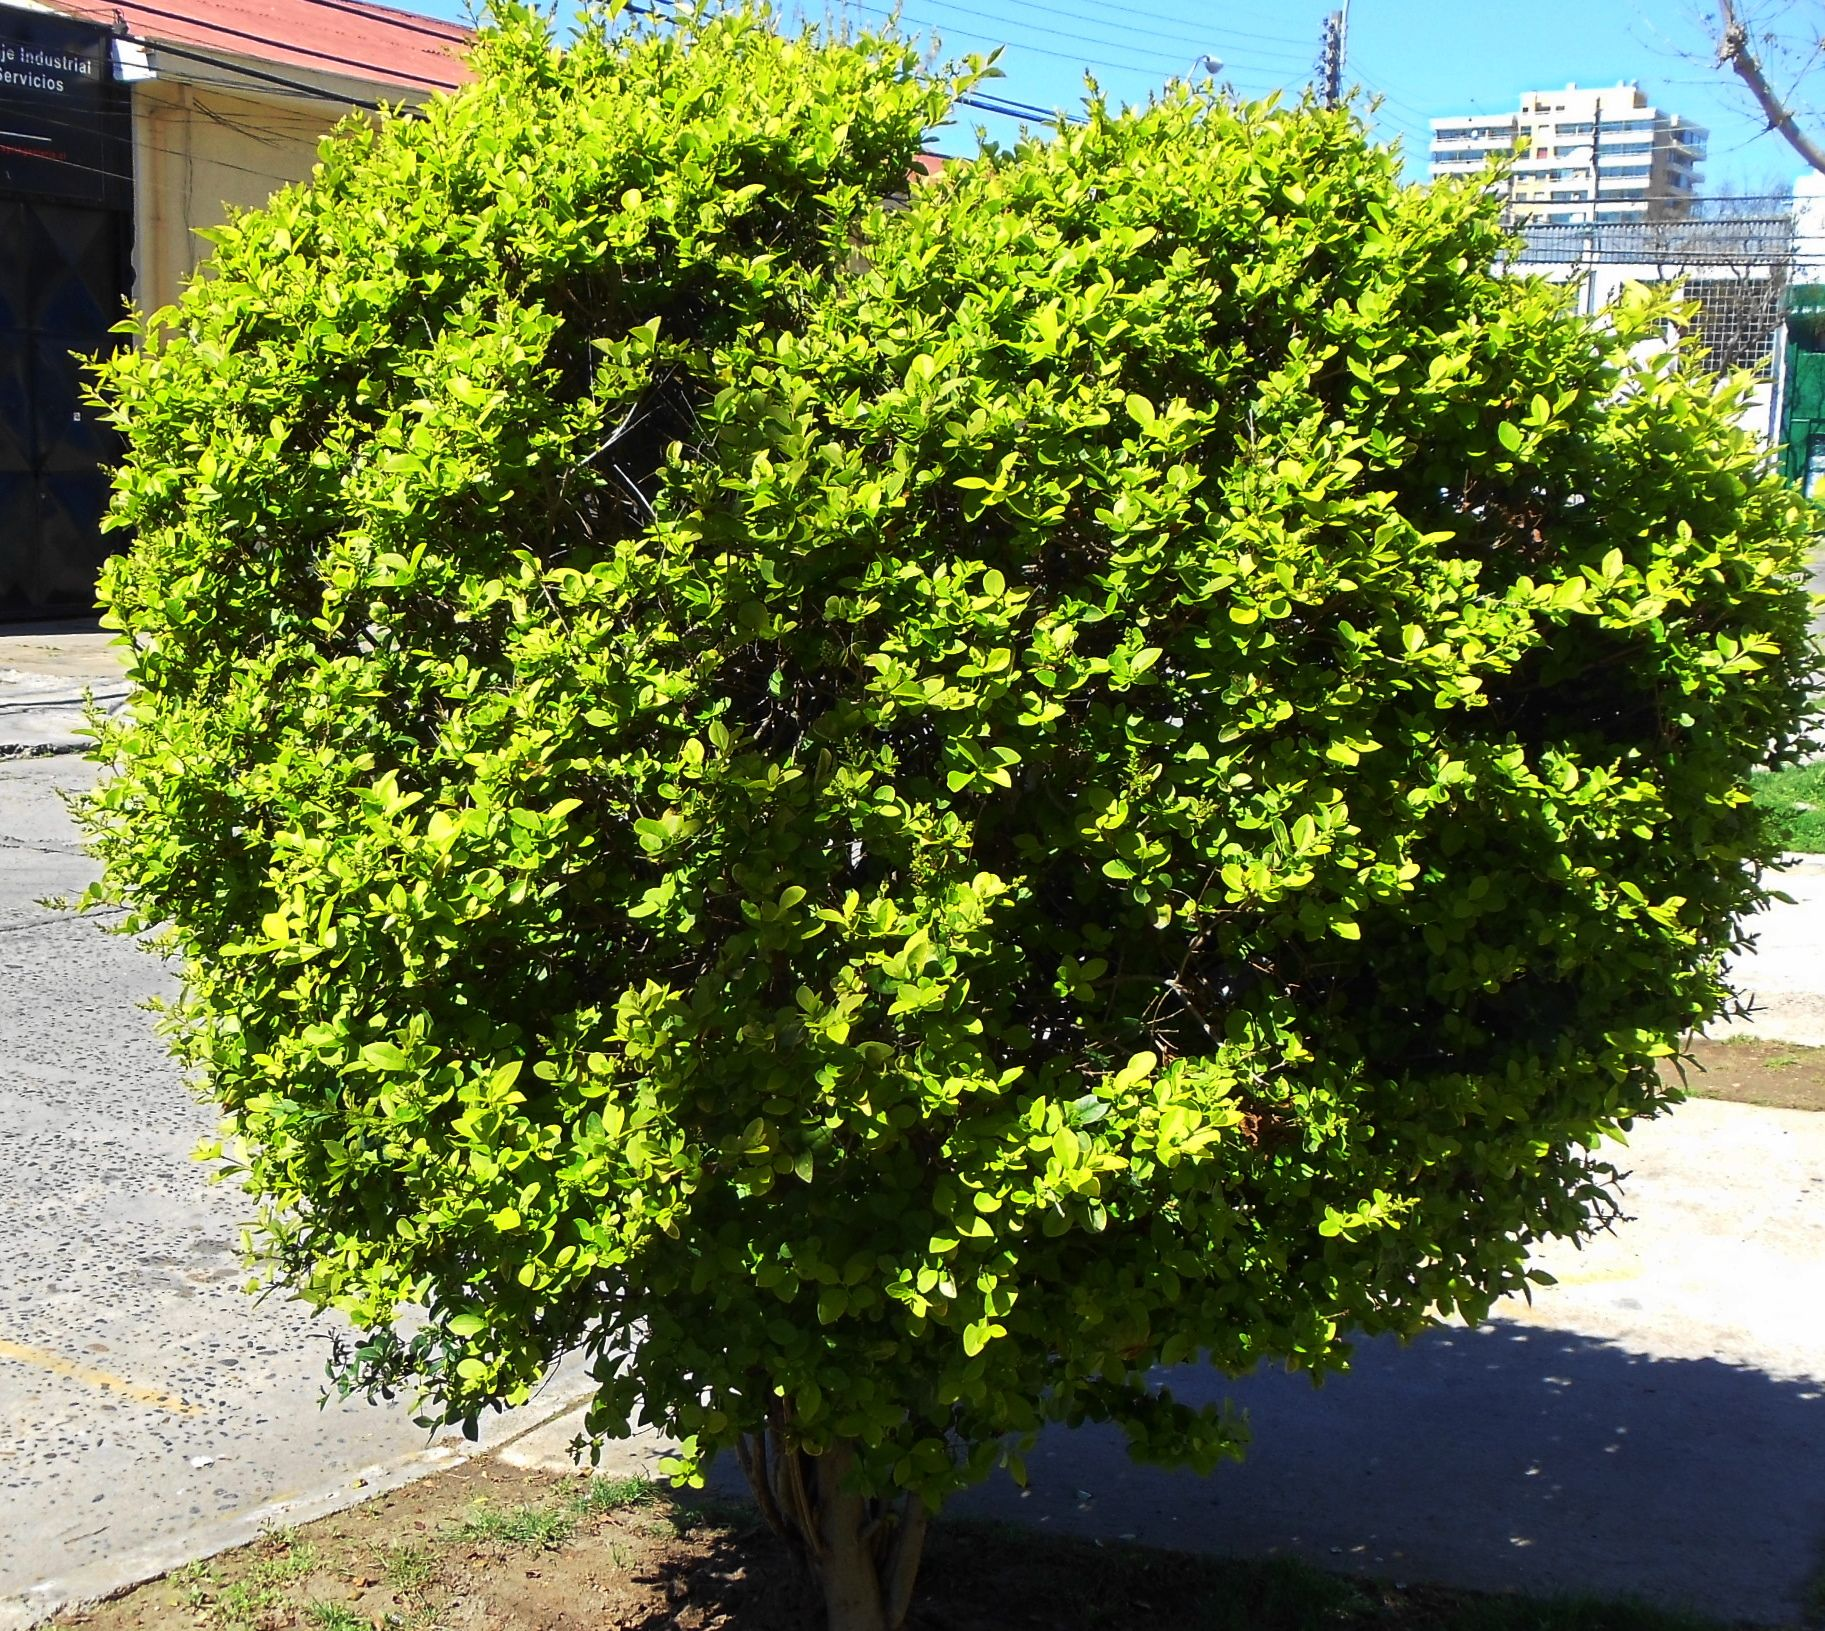 Arboles ornamentales de hoja perenne for Porque hay arboles de hoja perenne